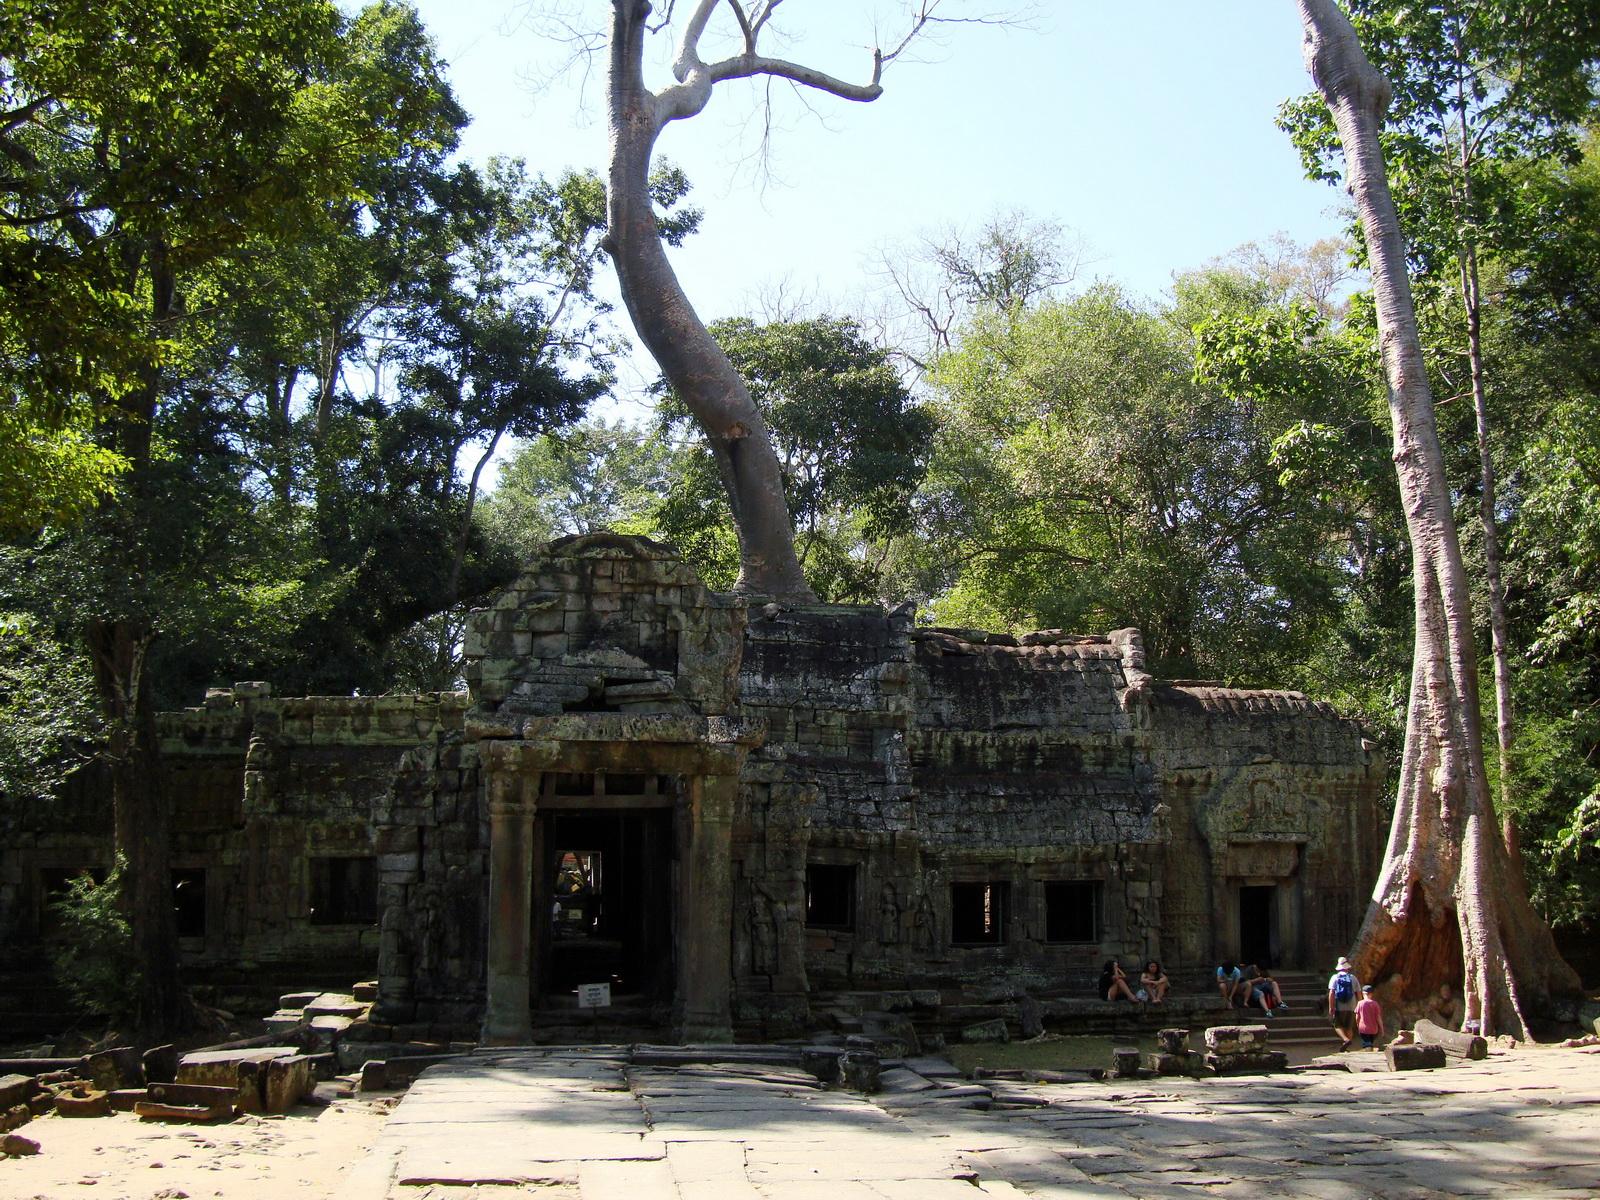 Ta Prohm Tomb Raider Bayon architecture Gopura 4 East entrance 03